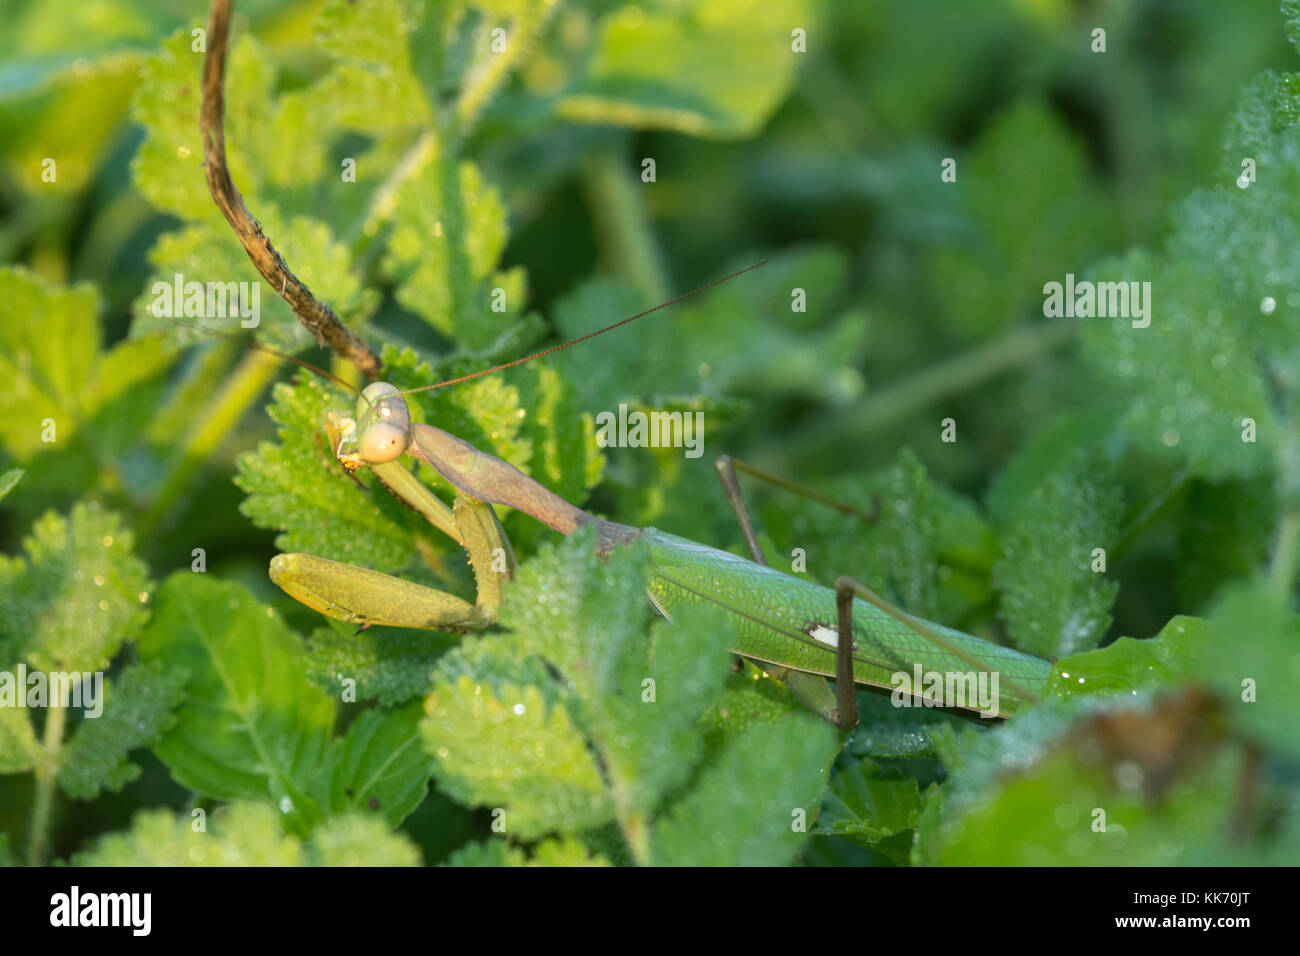 Close-up of female praying mantis (Sphodromantis viridis) in Cyprus Stock Photo